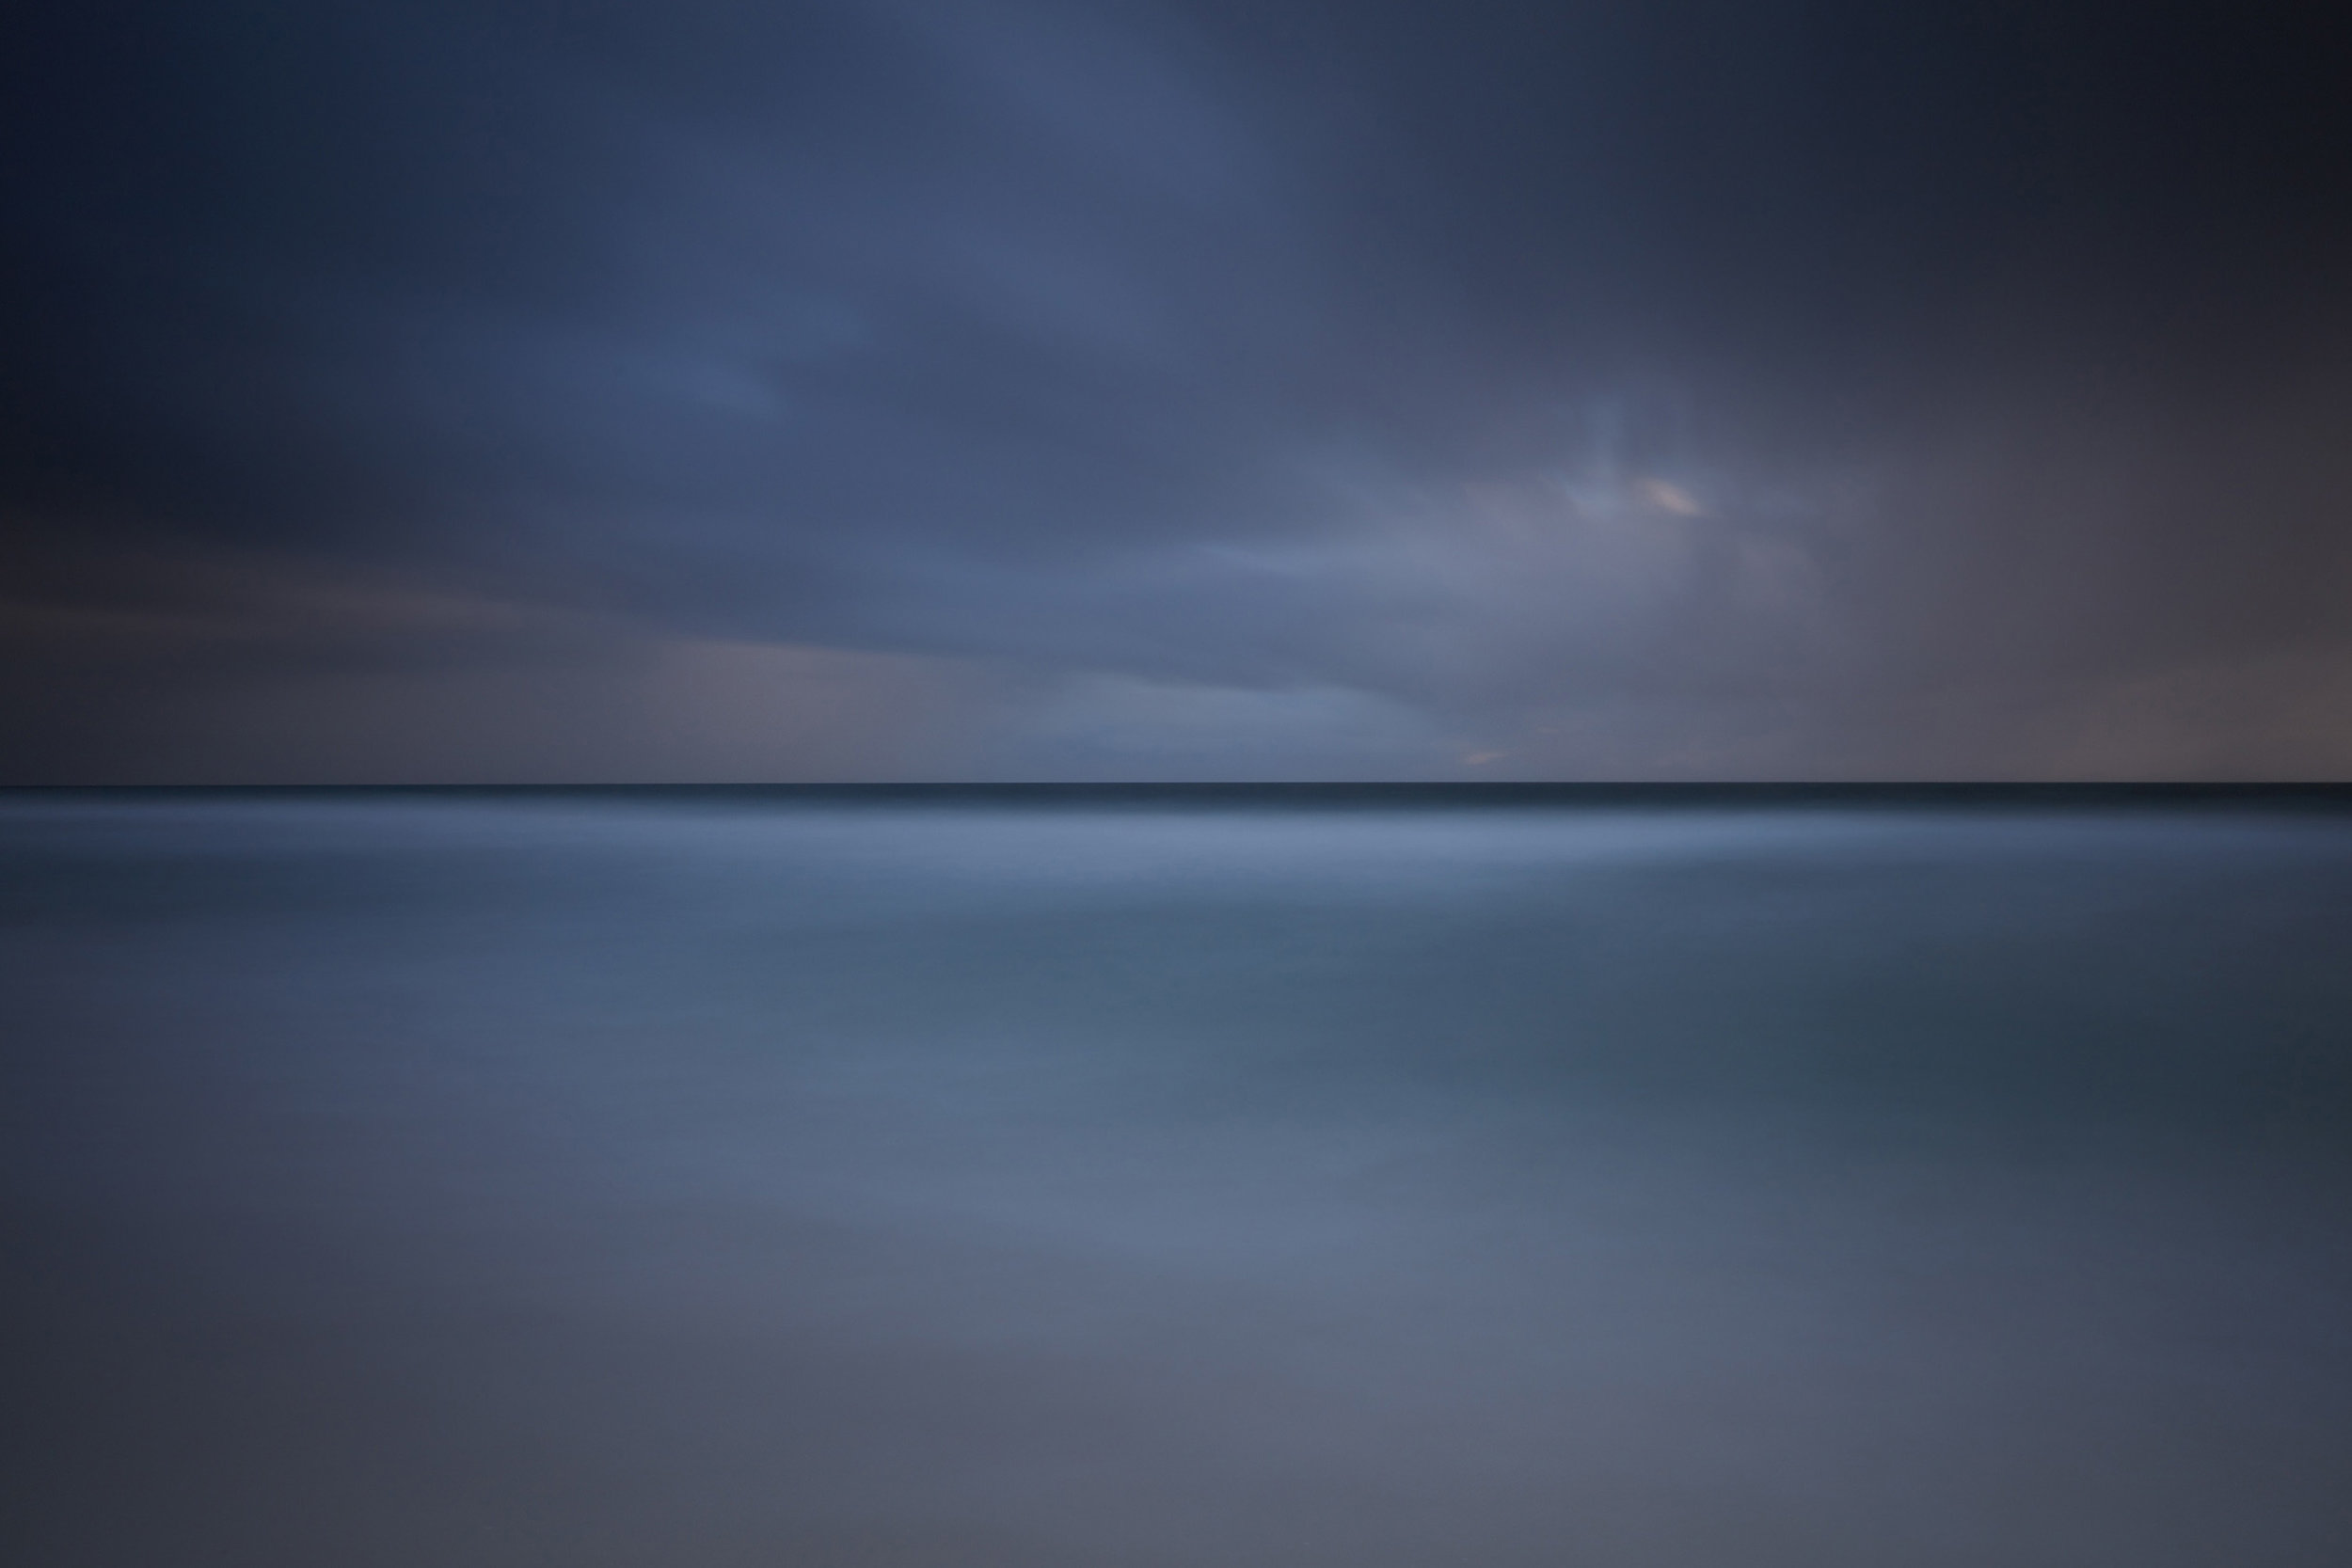 Patrick_Schuttler_Landscape_007.jpg